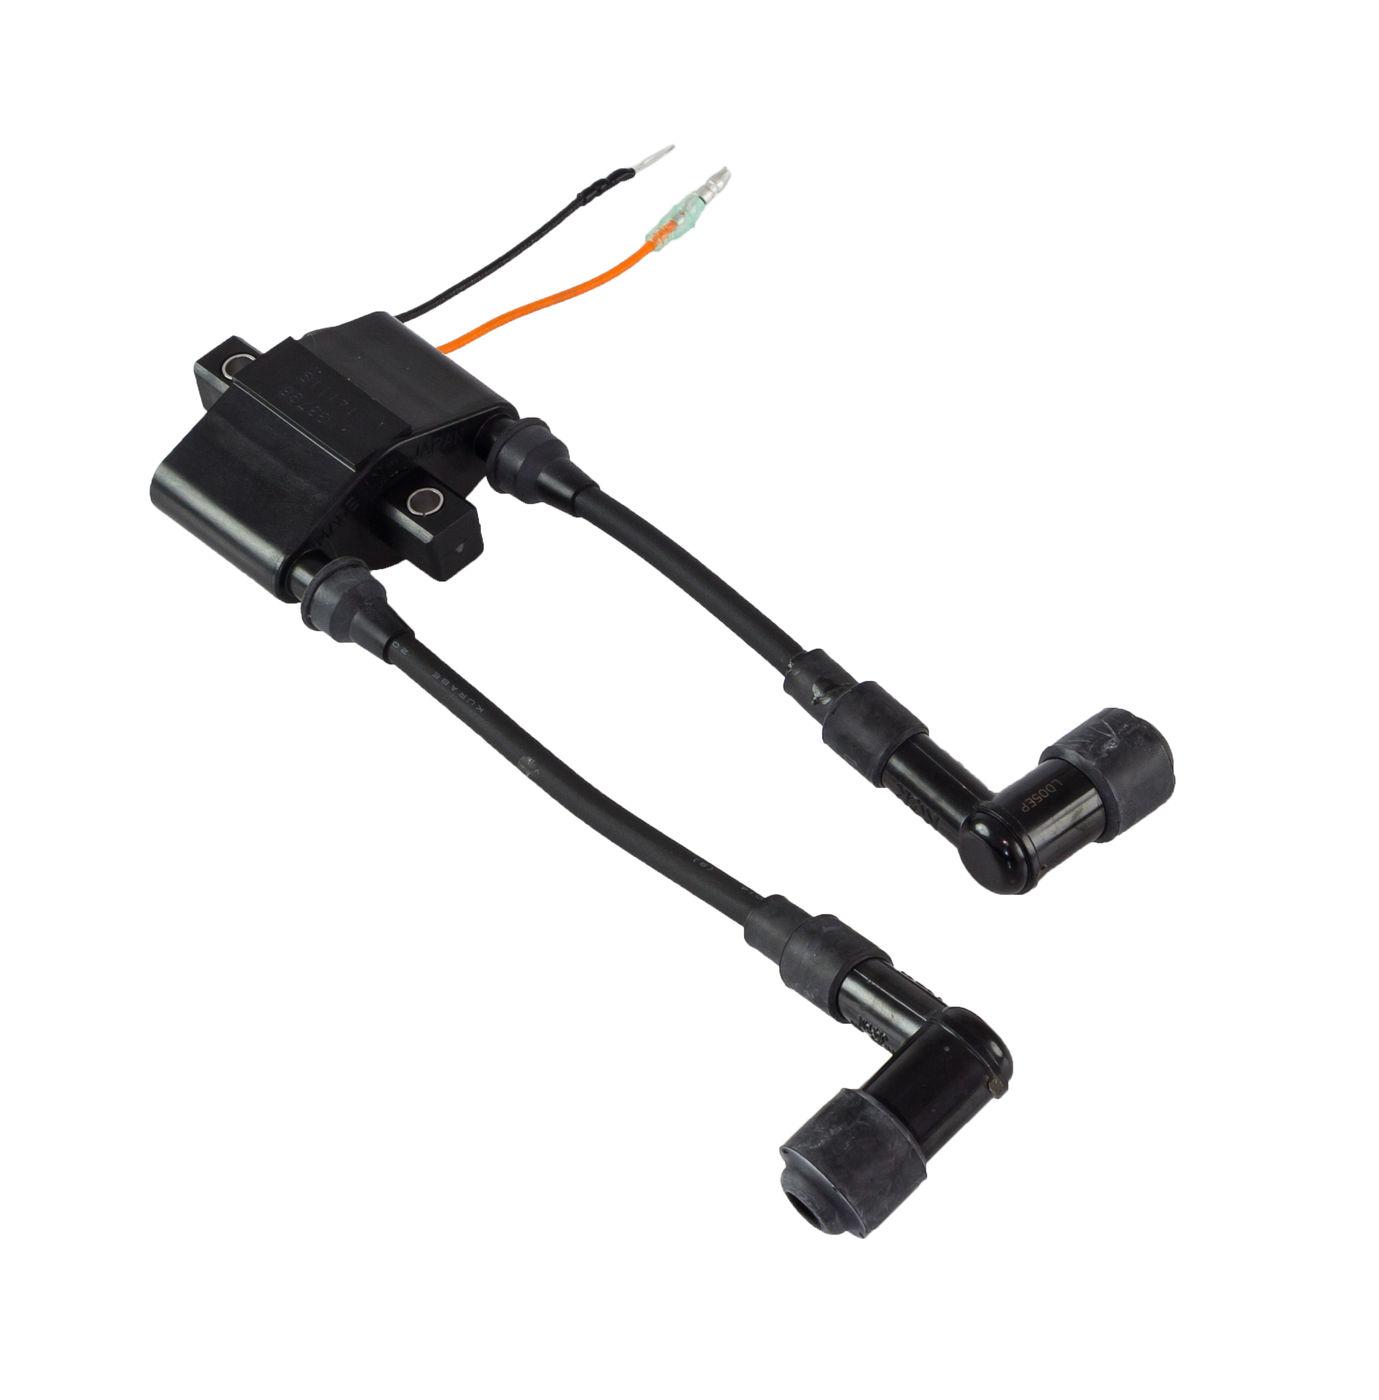 Ignition Coil Tohatsu MFS8A-9.8A 3V1060400